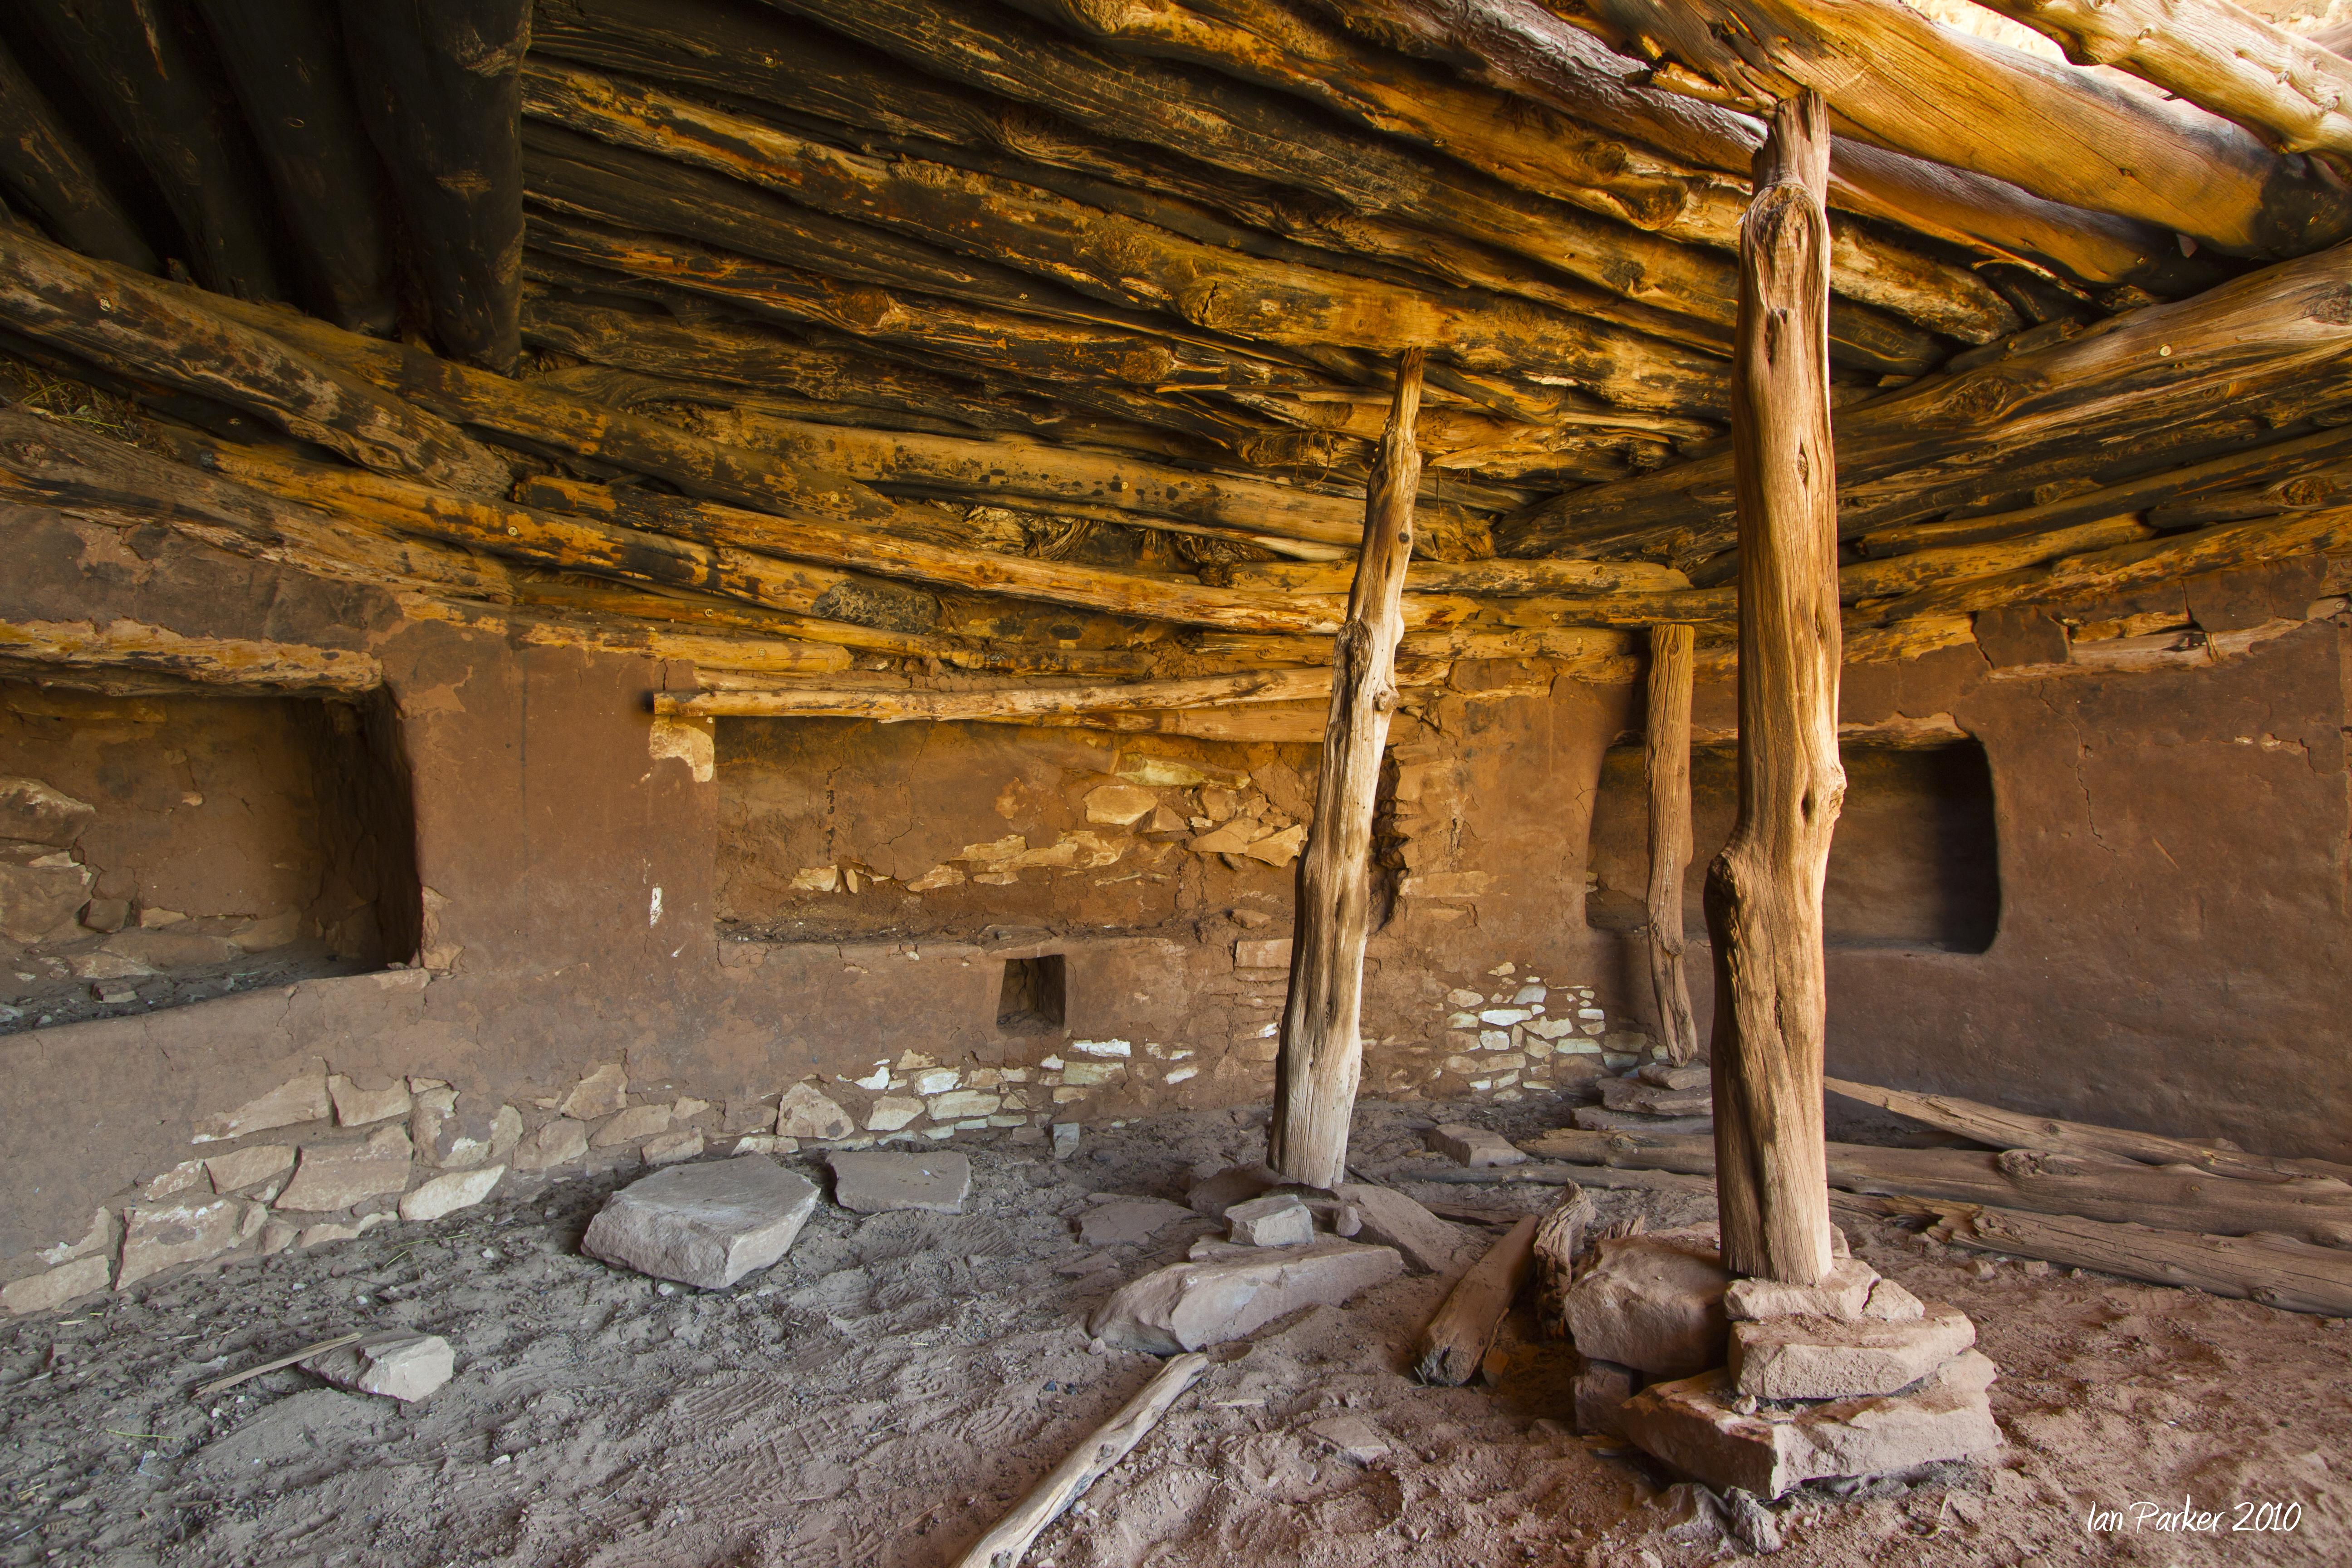 Evanescent Light Anasazi Ruins